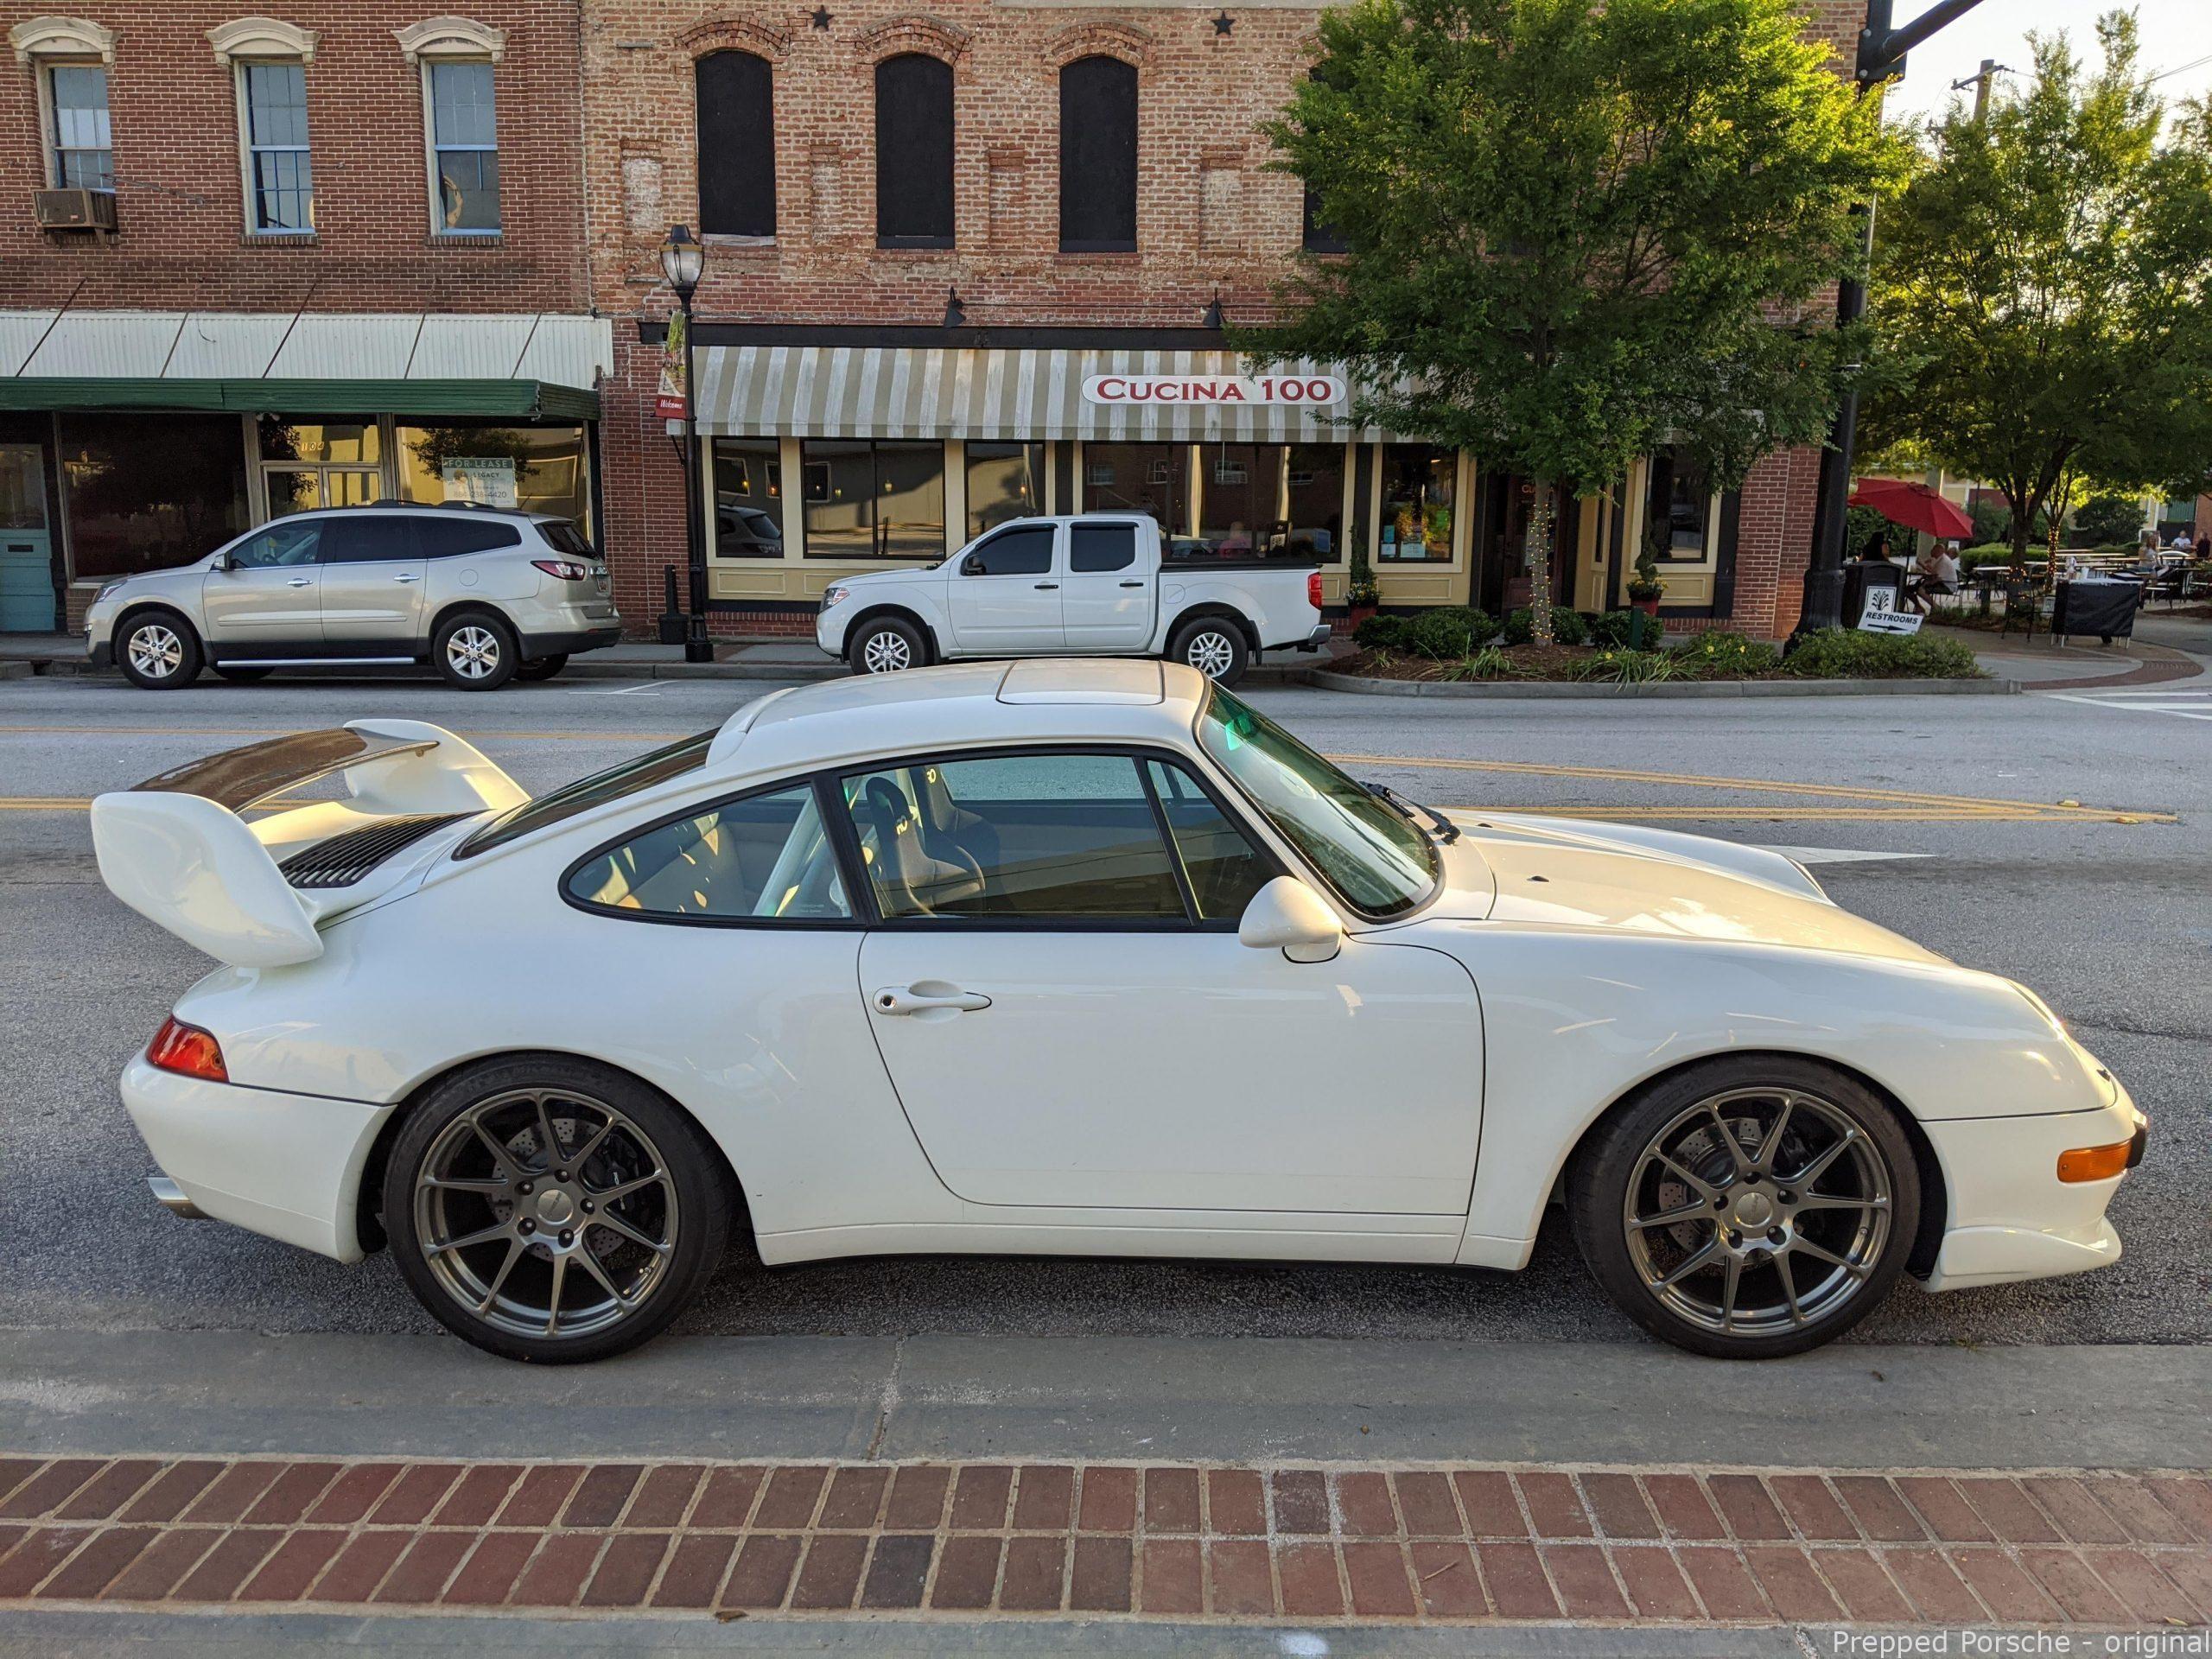 Prepped Porsche Original Cars In 2020 Porsche Amazing Cars Shelby Car